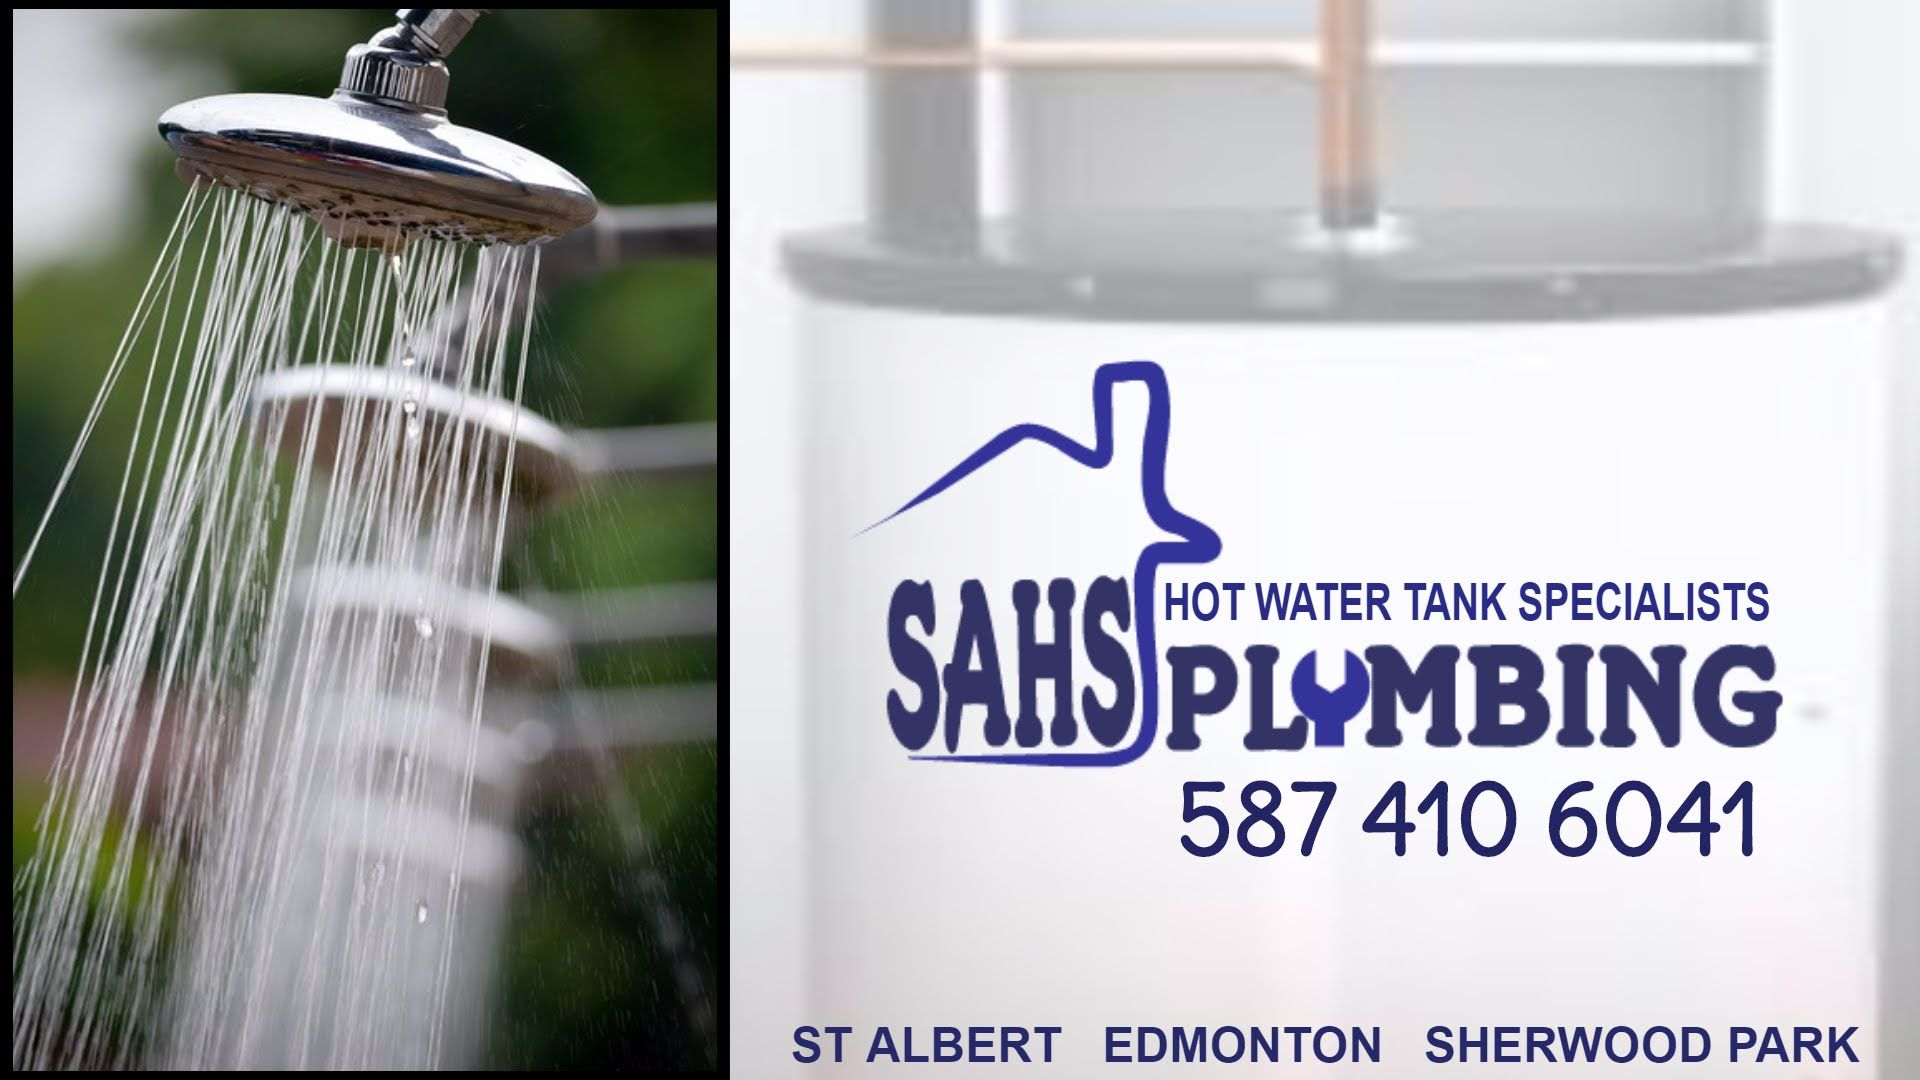 Hot Water Tank St Albert - SAHS Plumbing At Your Service - Hot Water Tan...